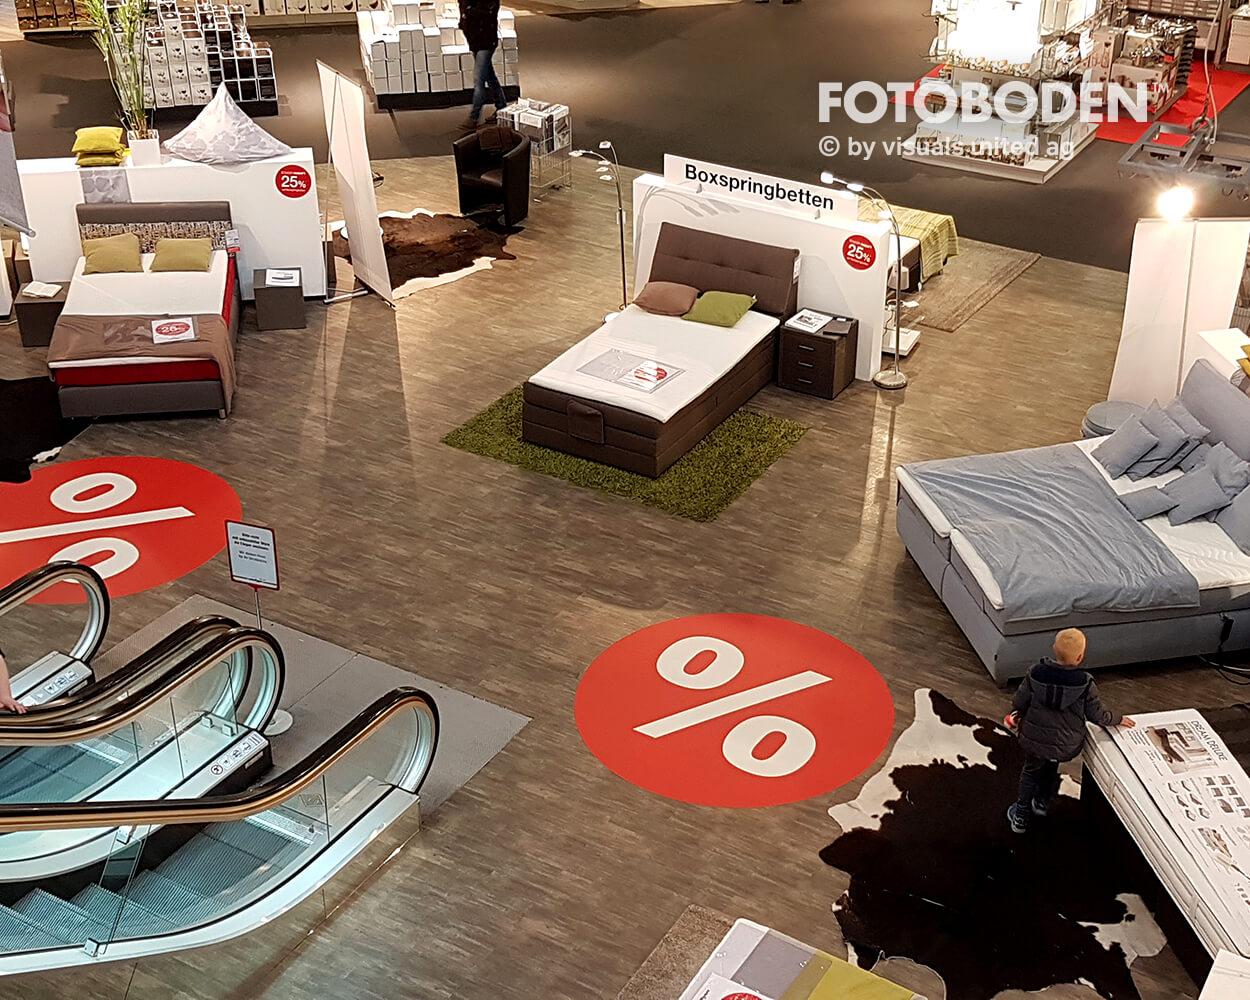 Fotoboden Teppich bedrucken Bodendisplay Kundenstopper